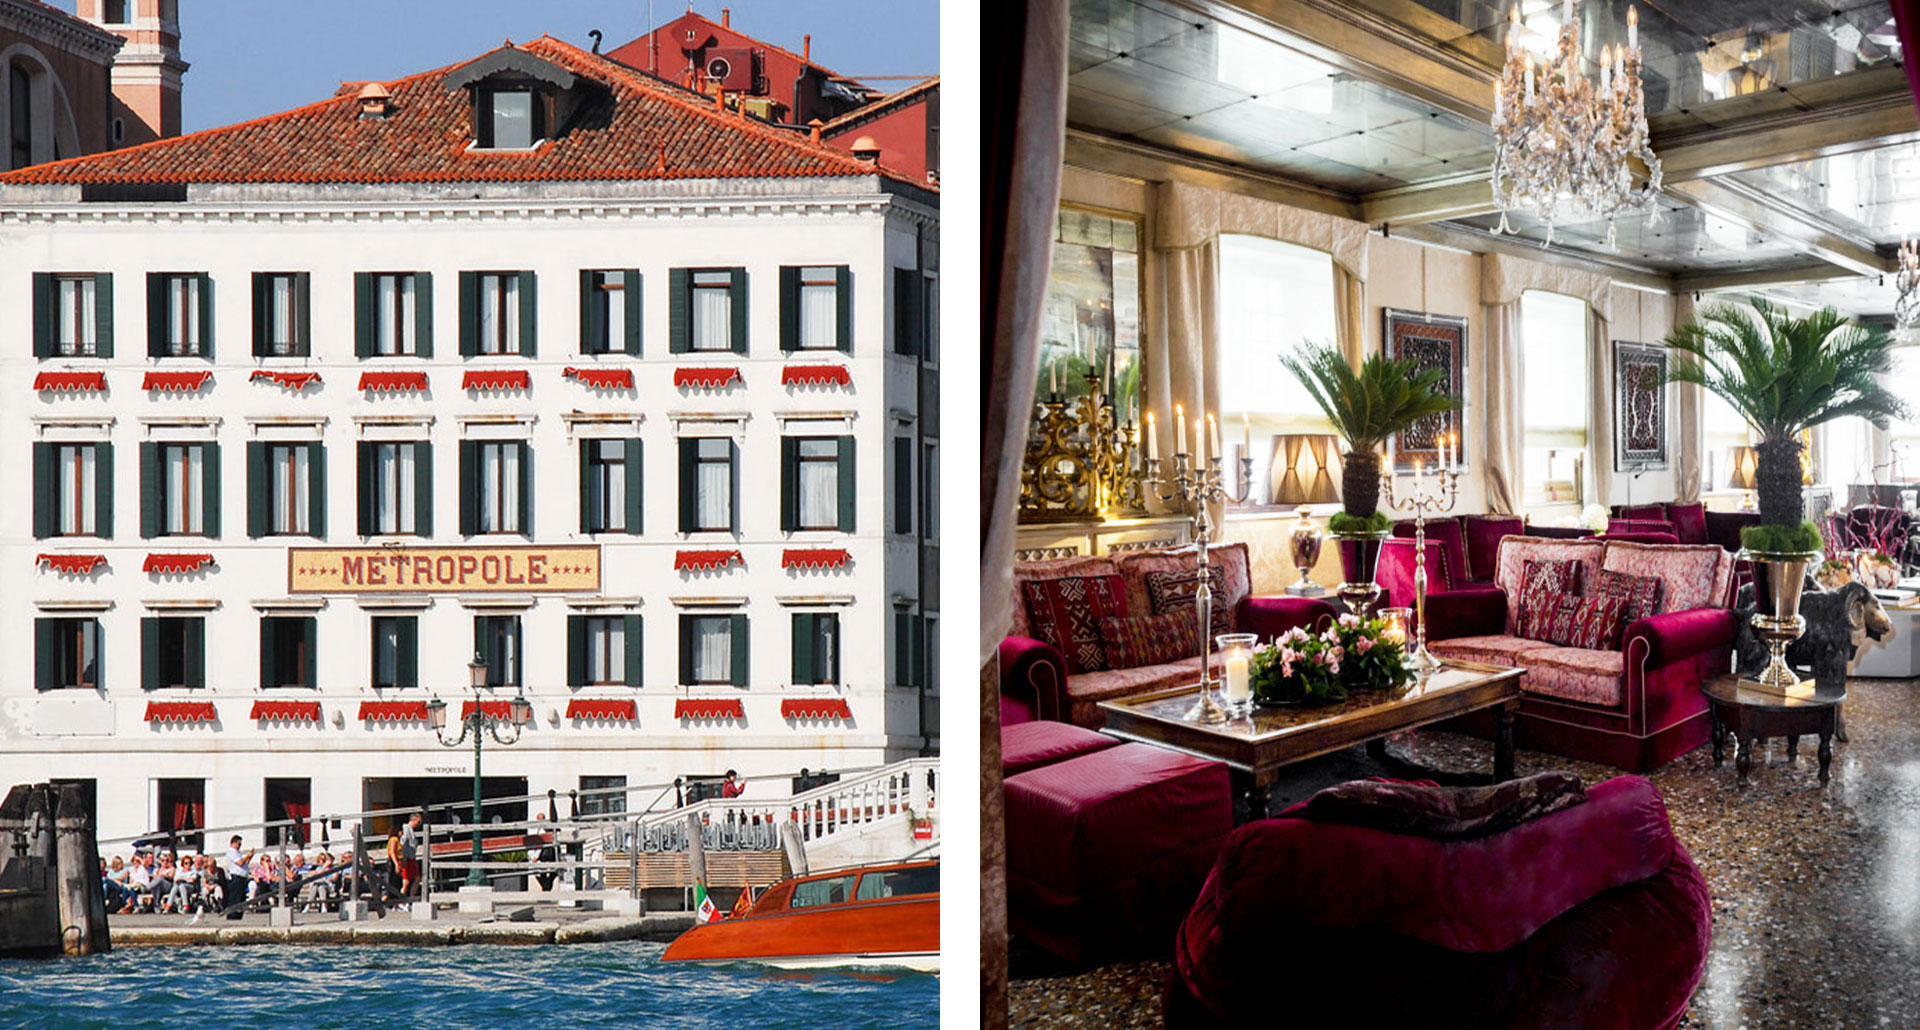 Metropole Hotel Venice - boutique hotel in Venice